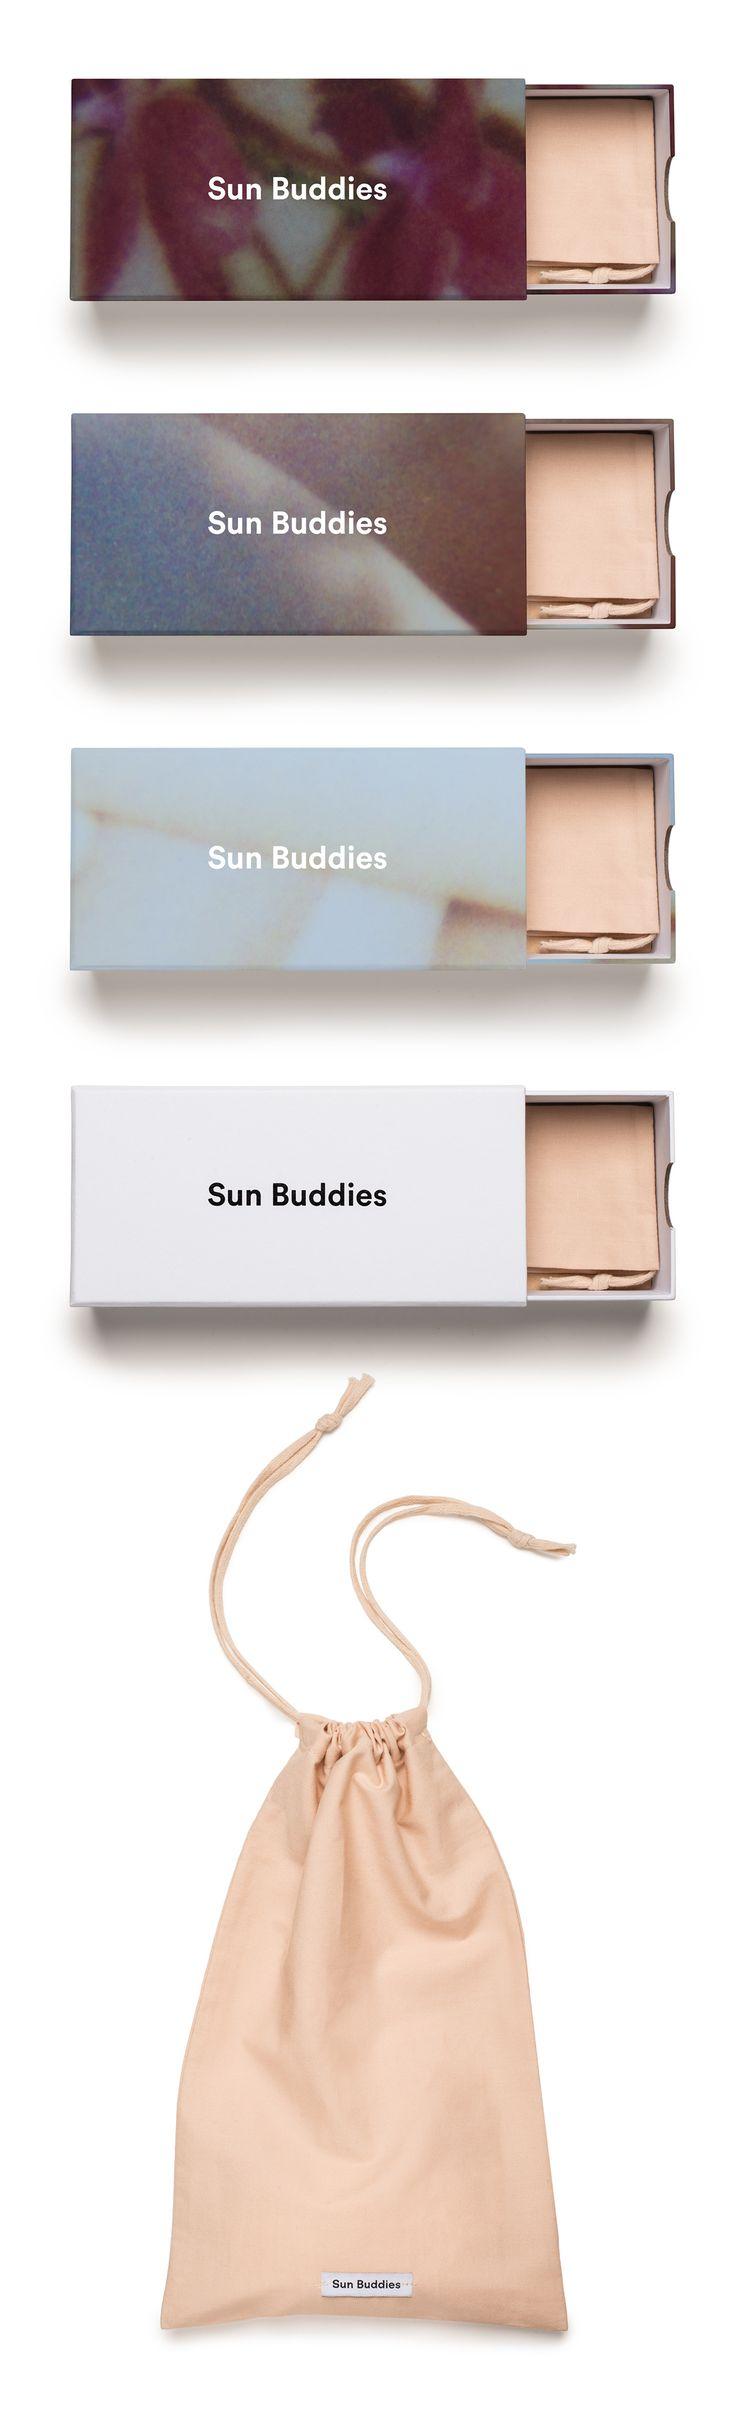 Sun Buddies — Branding